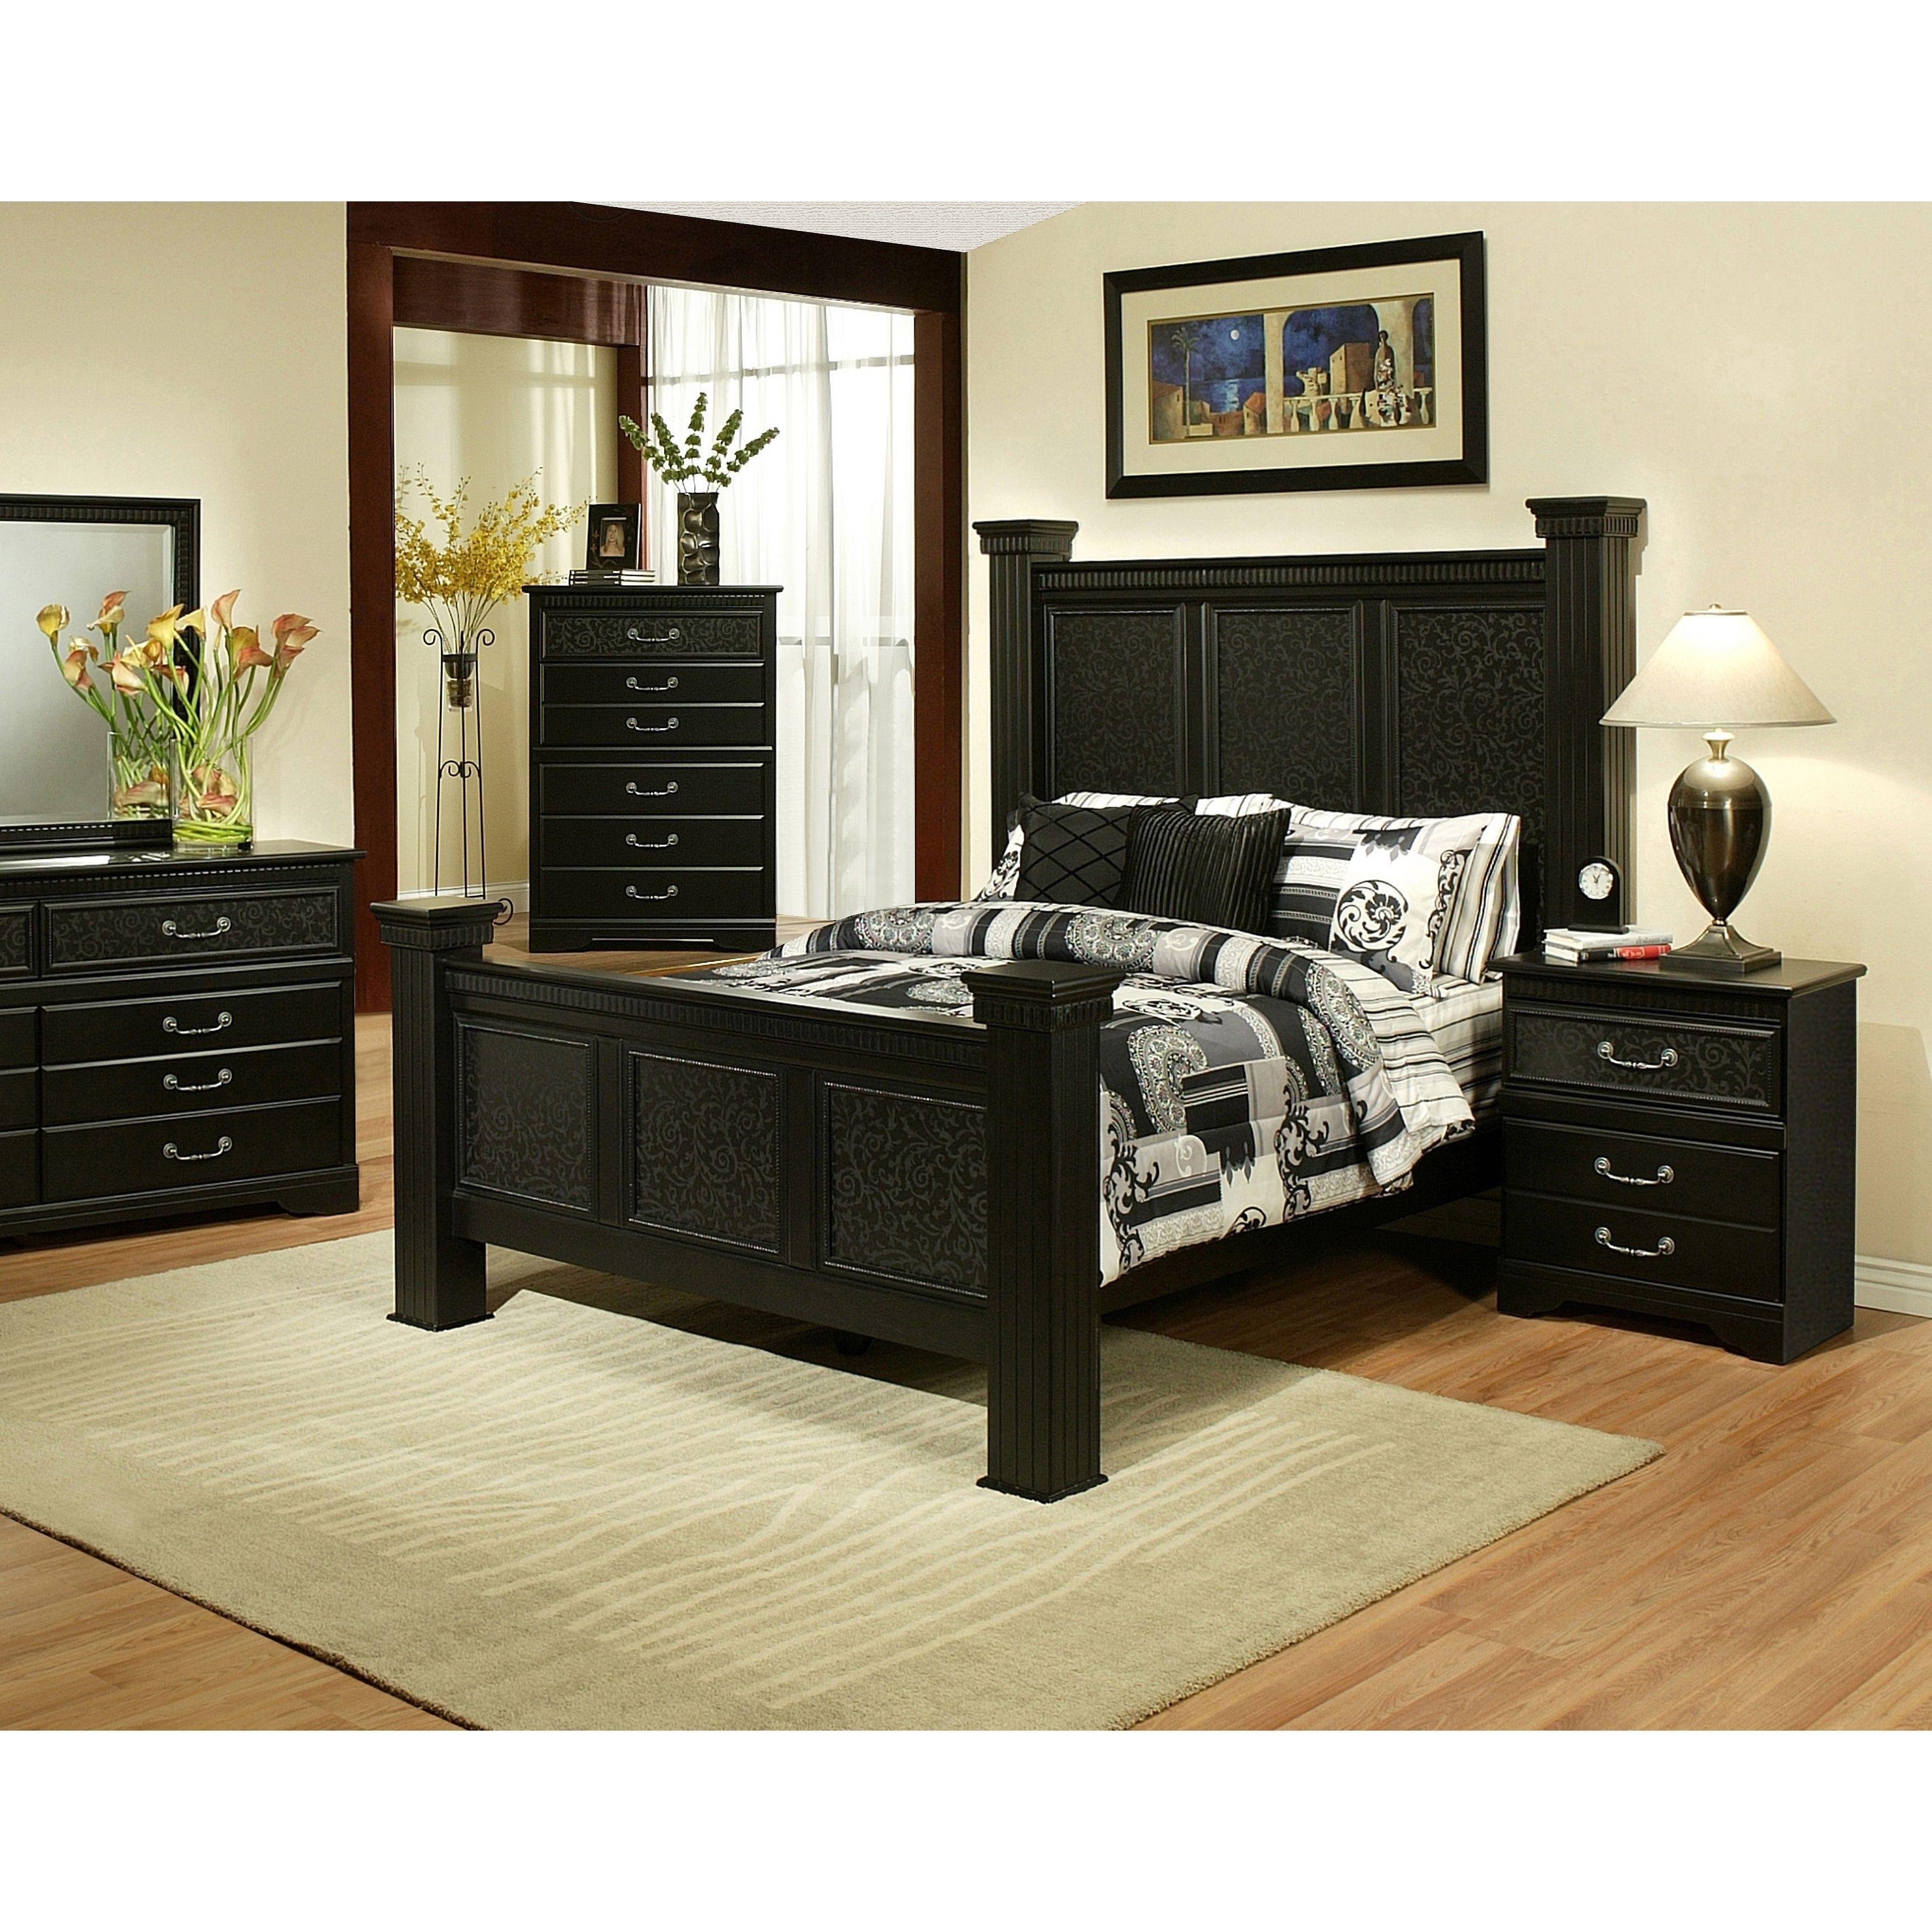 ideas bed set sets design best size ikea simple of bedroom beautiful dark king queen black